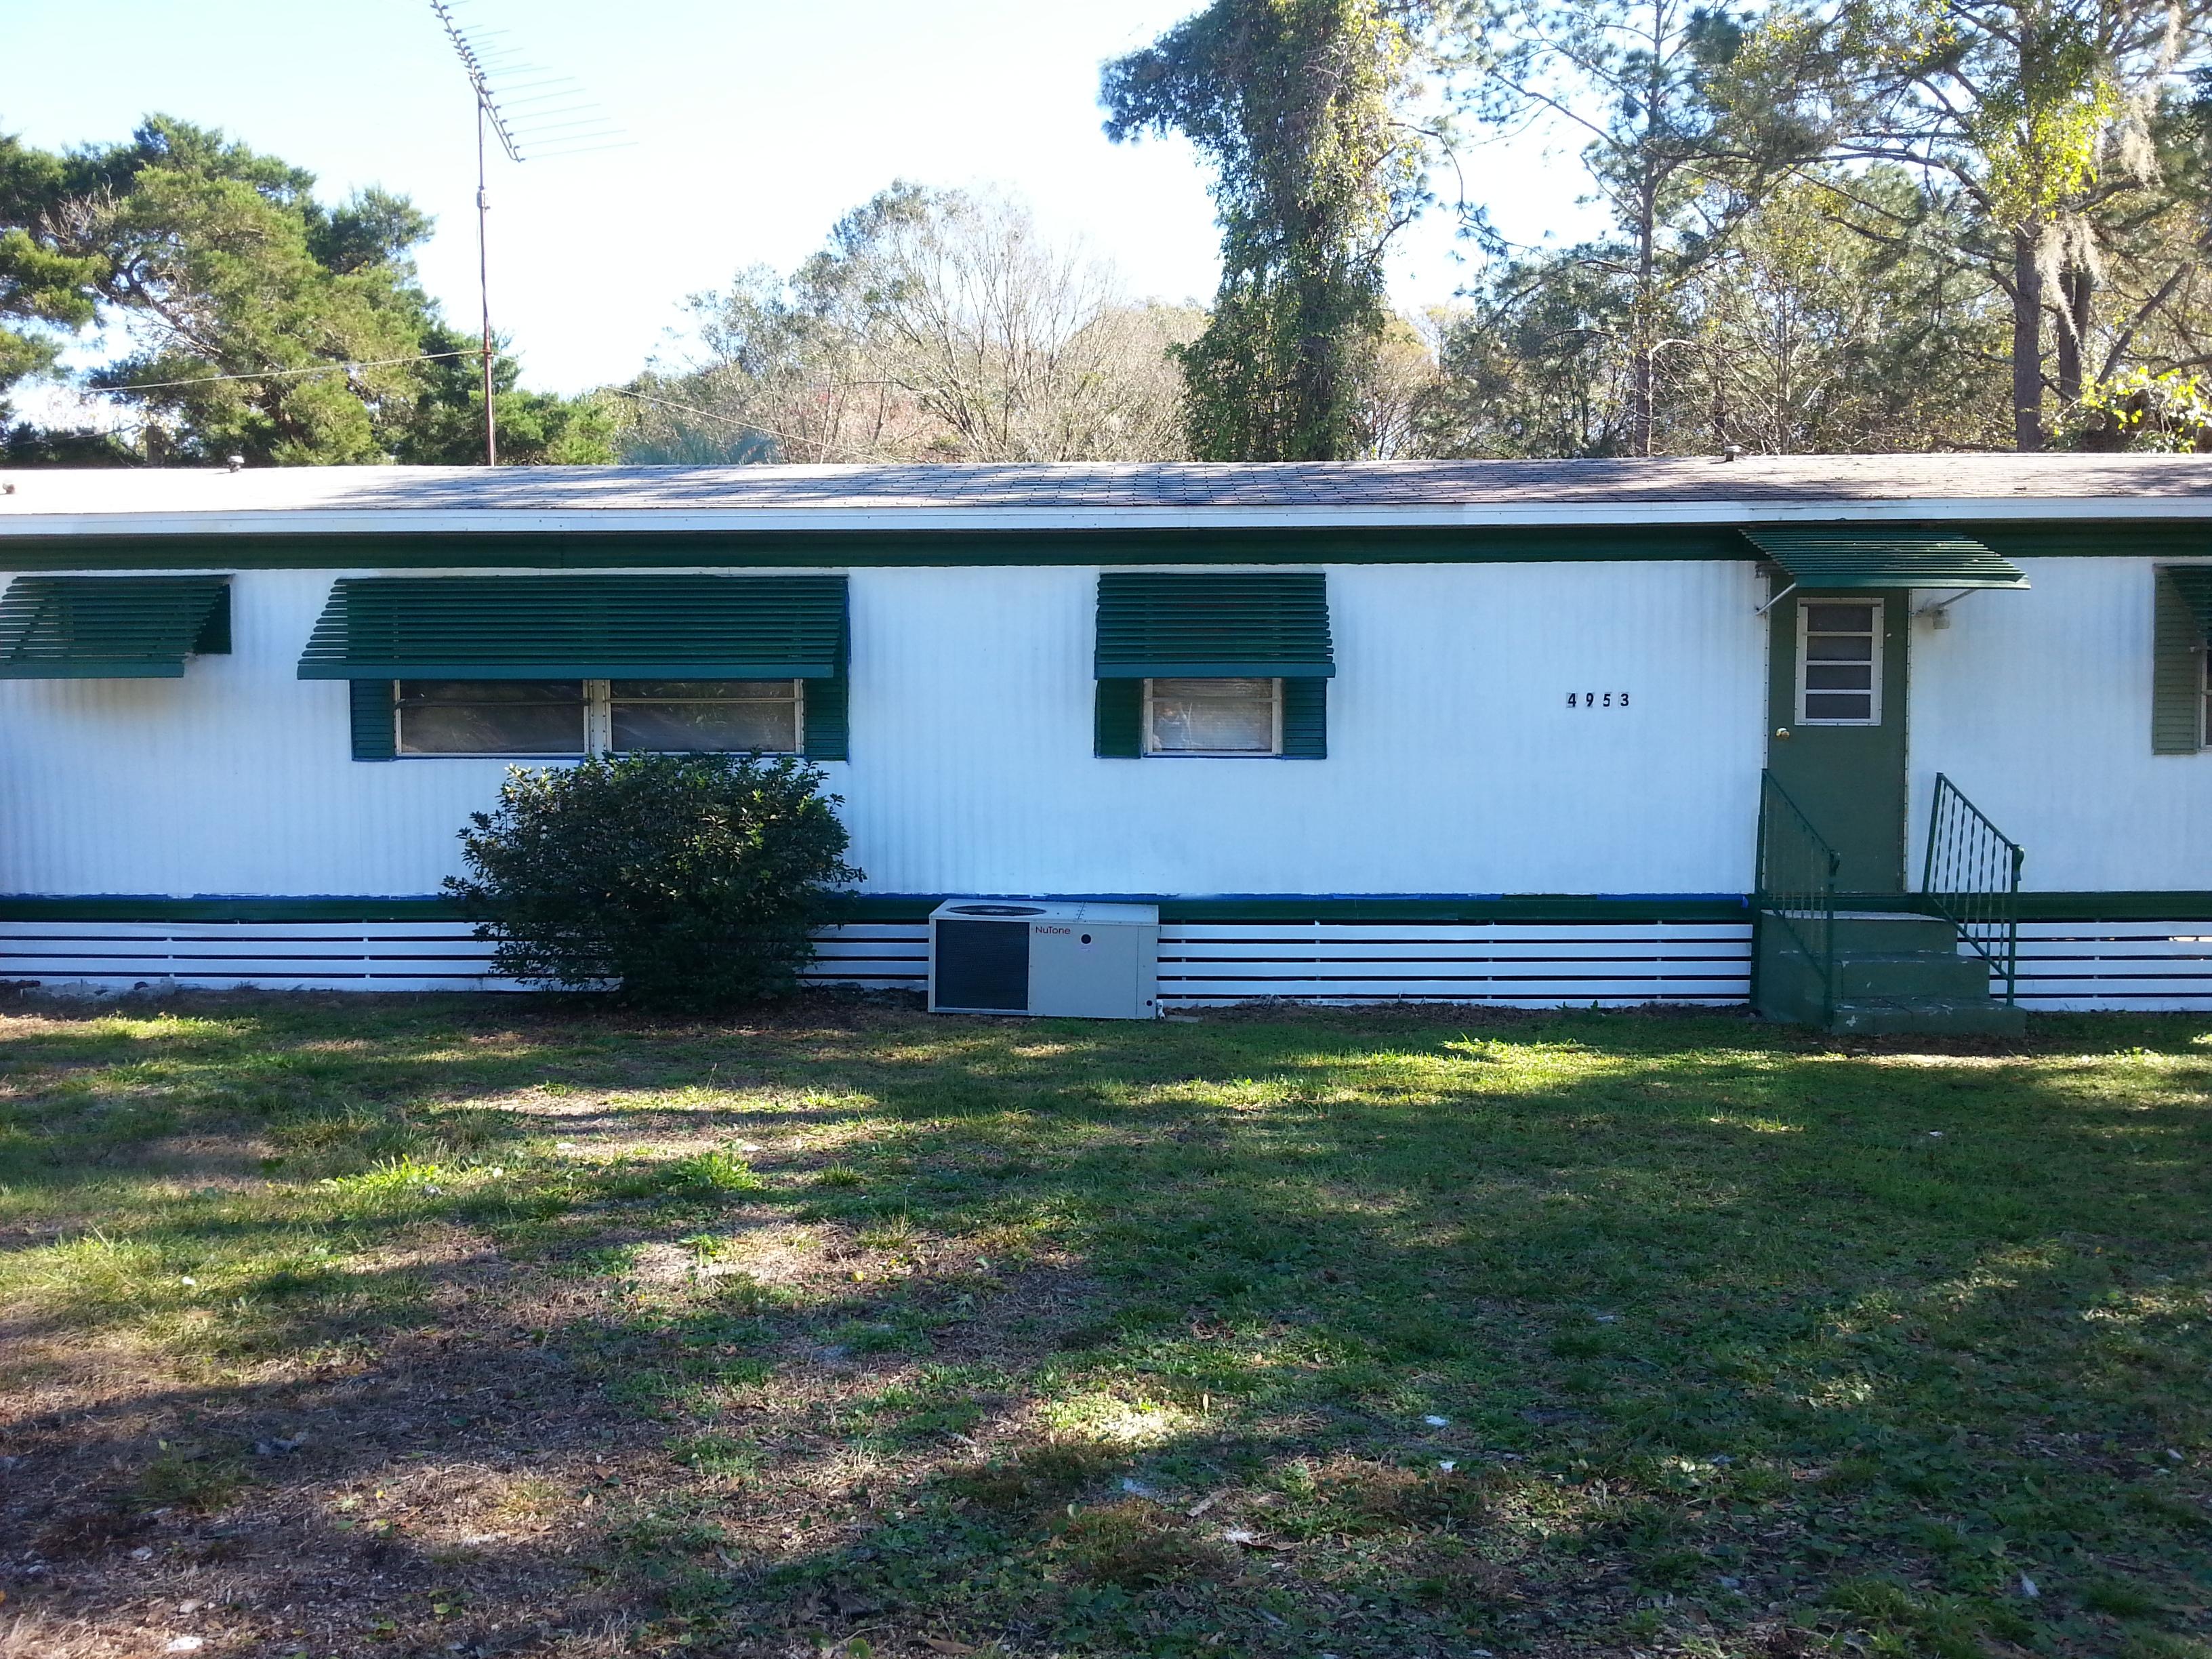 4953 S. Stokes Ferry Road, Hernando, Florida 34442